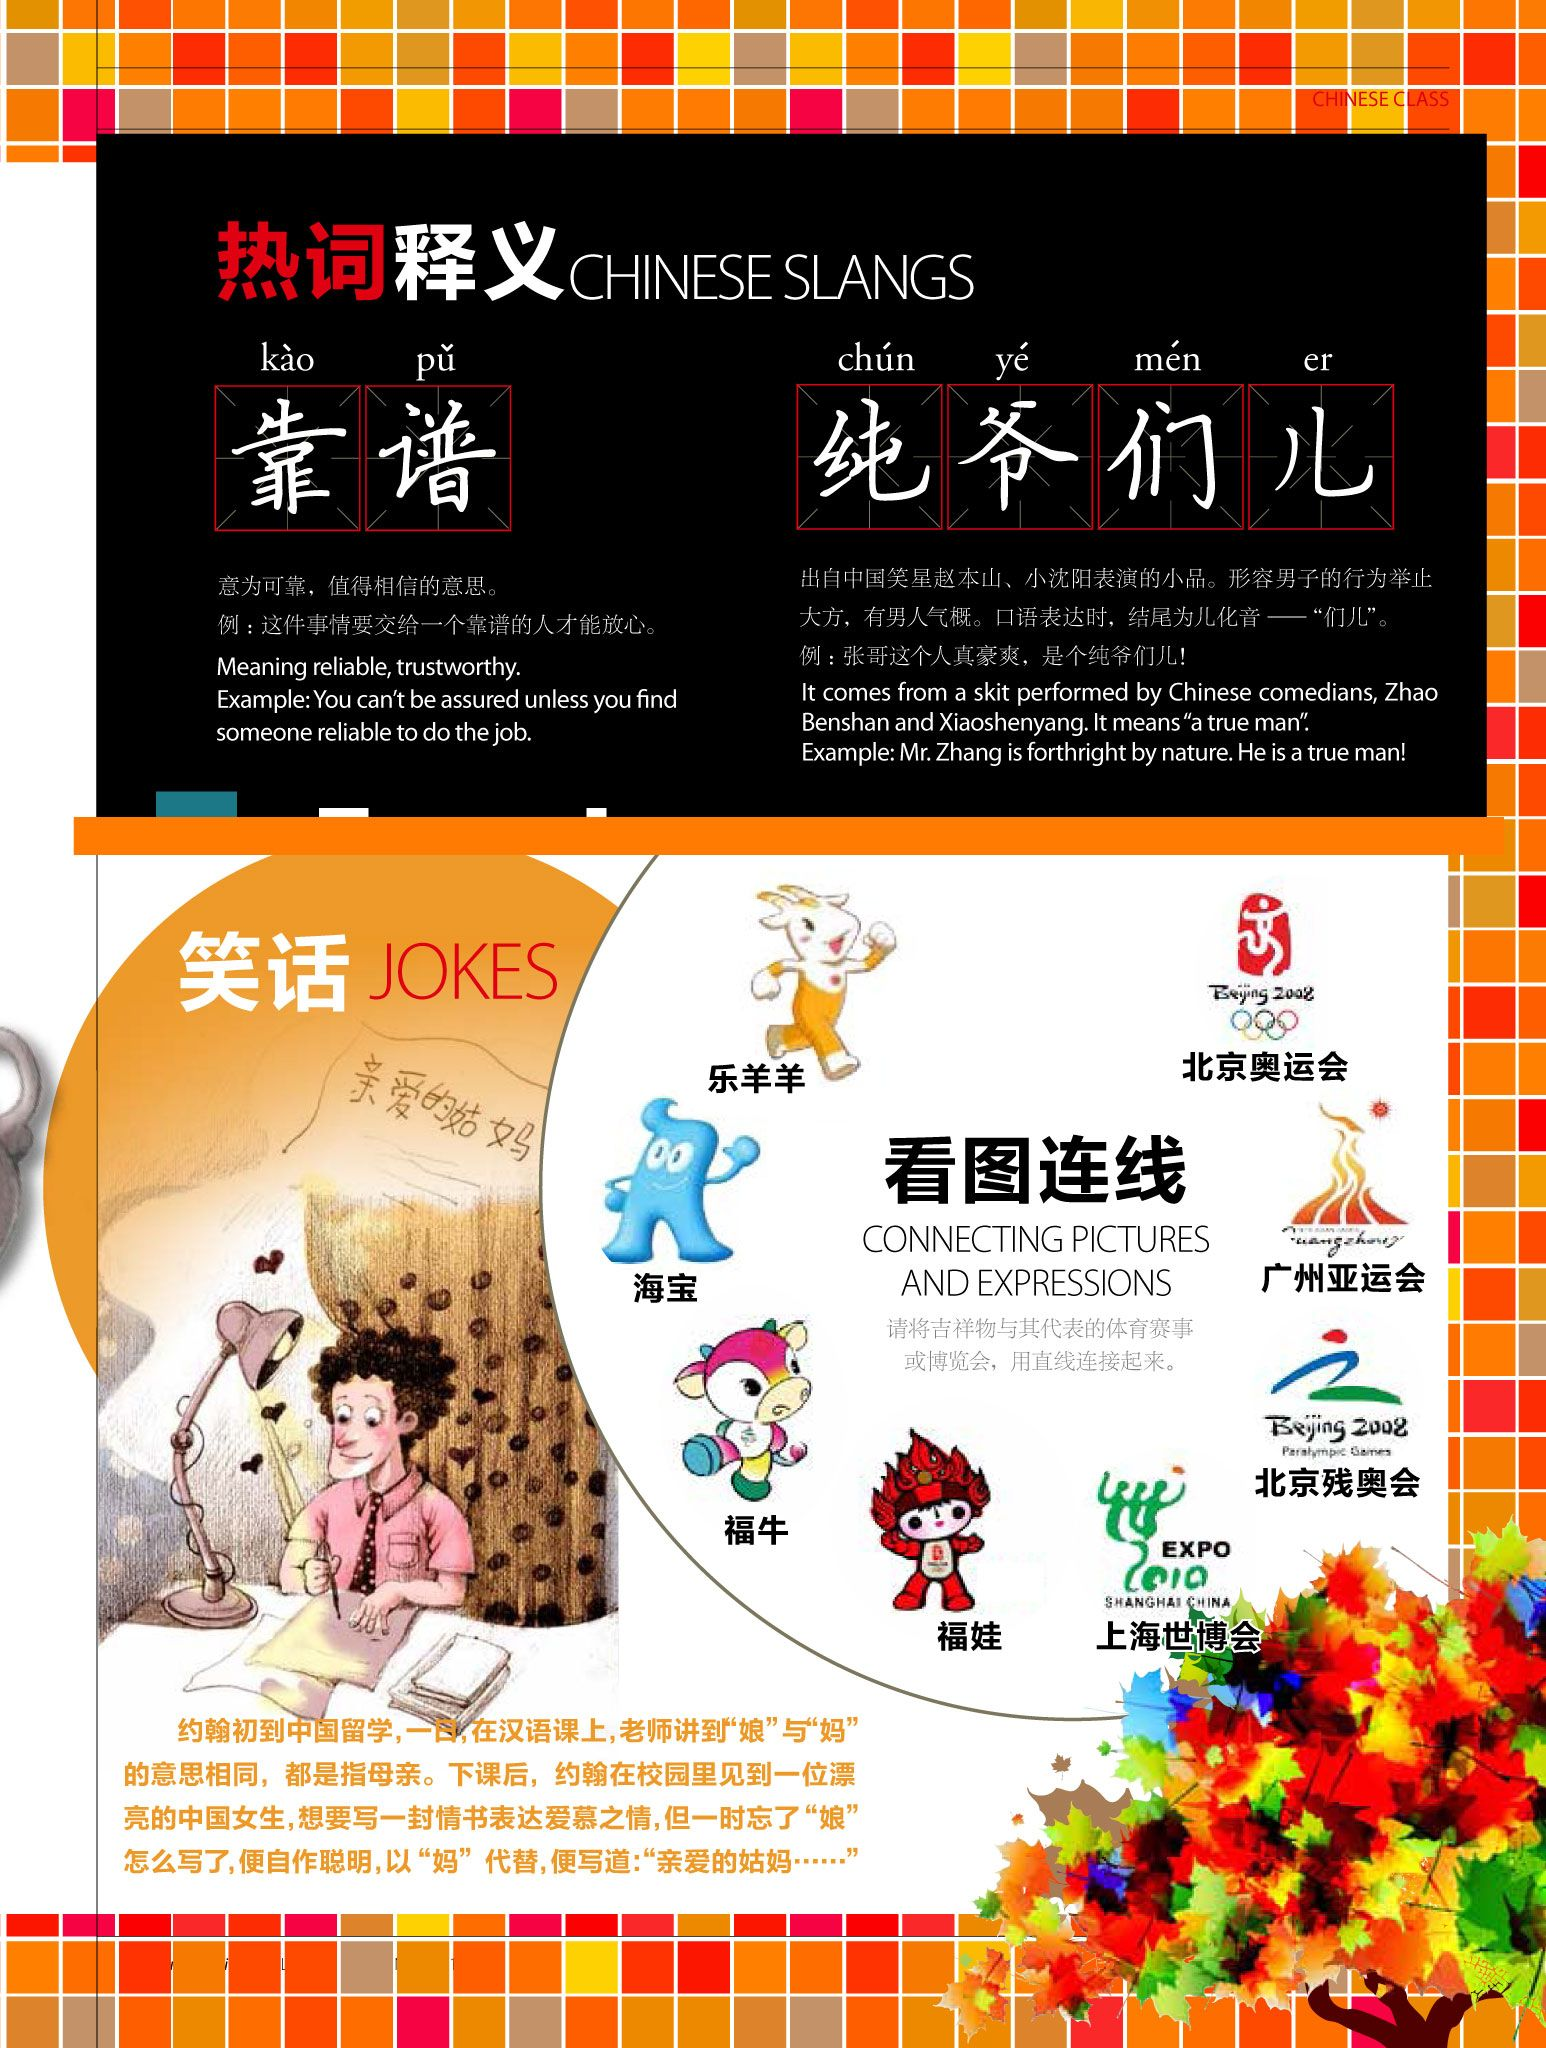 Chinese Class 10 Crossword Fun Idioms Jokes